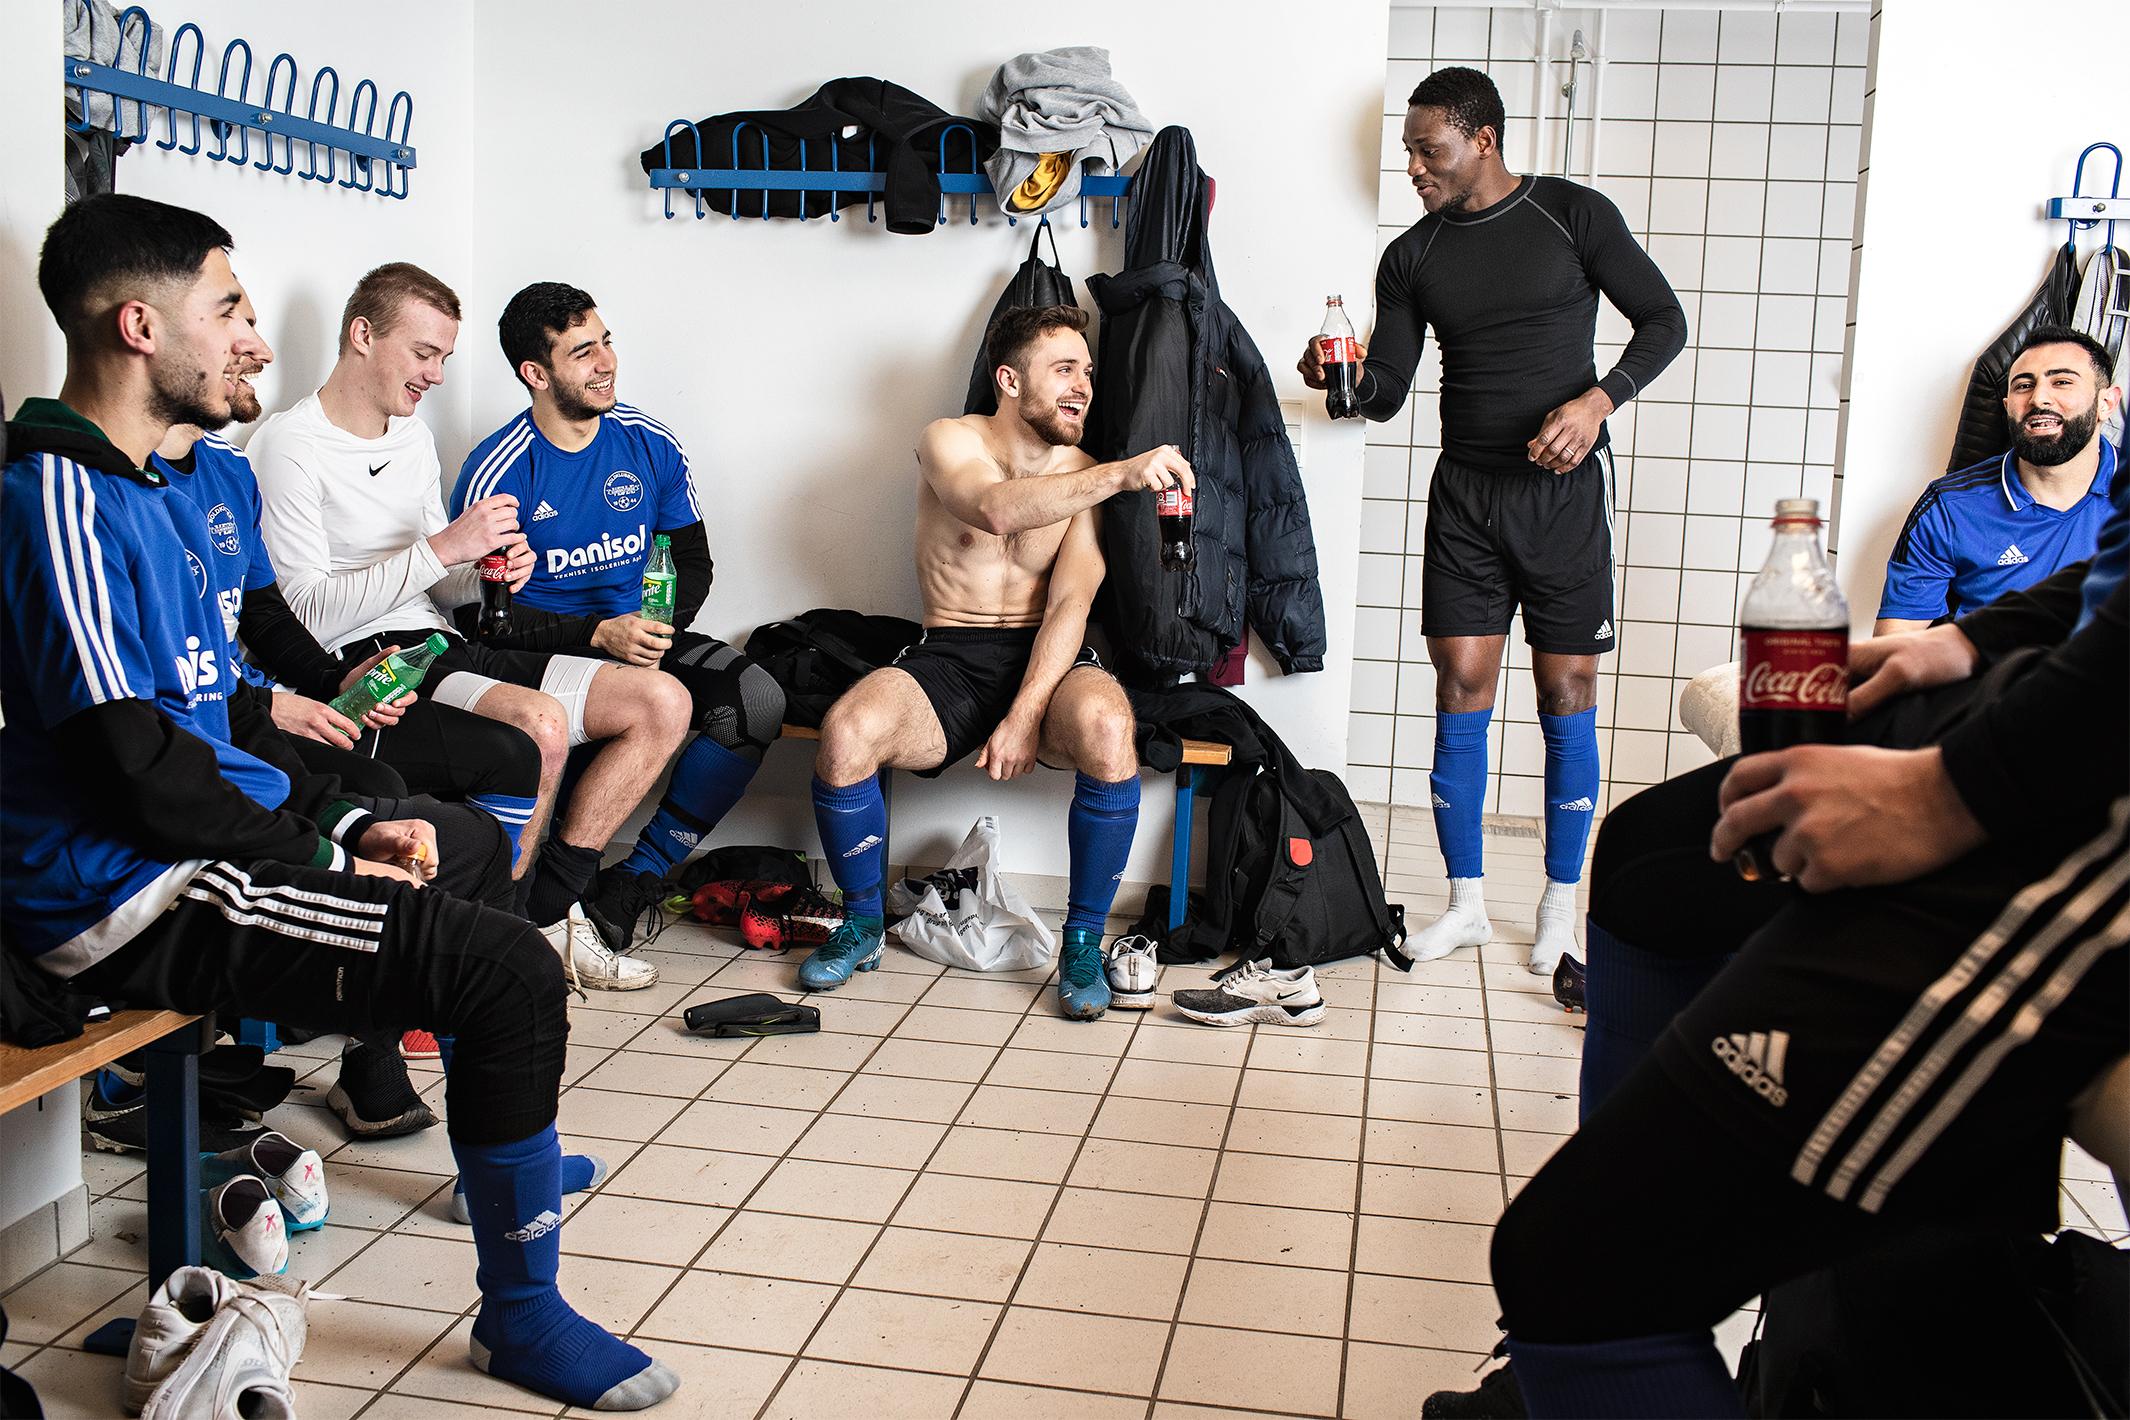 Coca-Cola vil styrke sportsklubber i Lyngby med OL-konkurrence